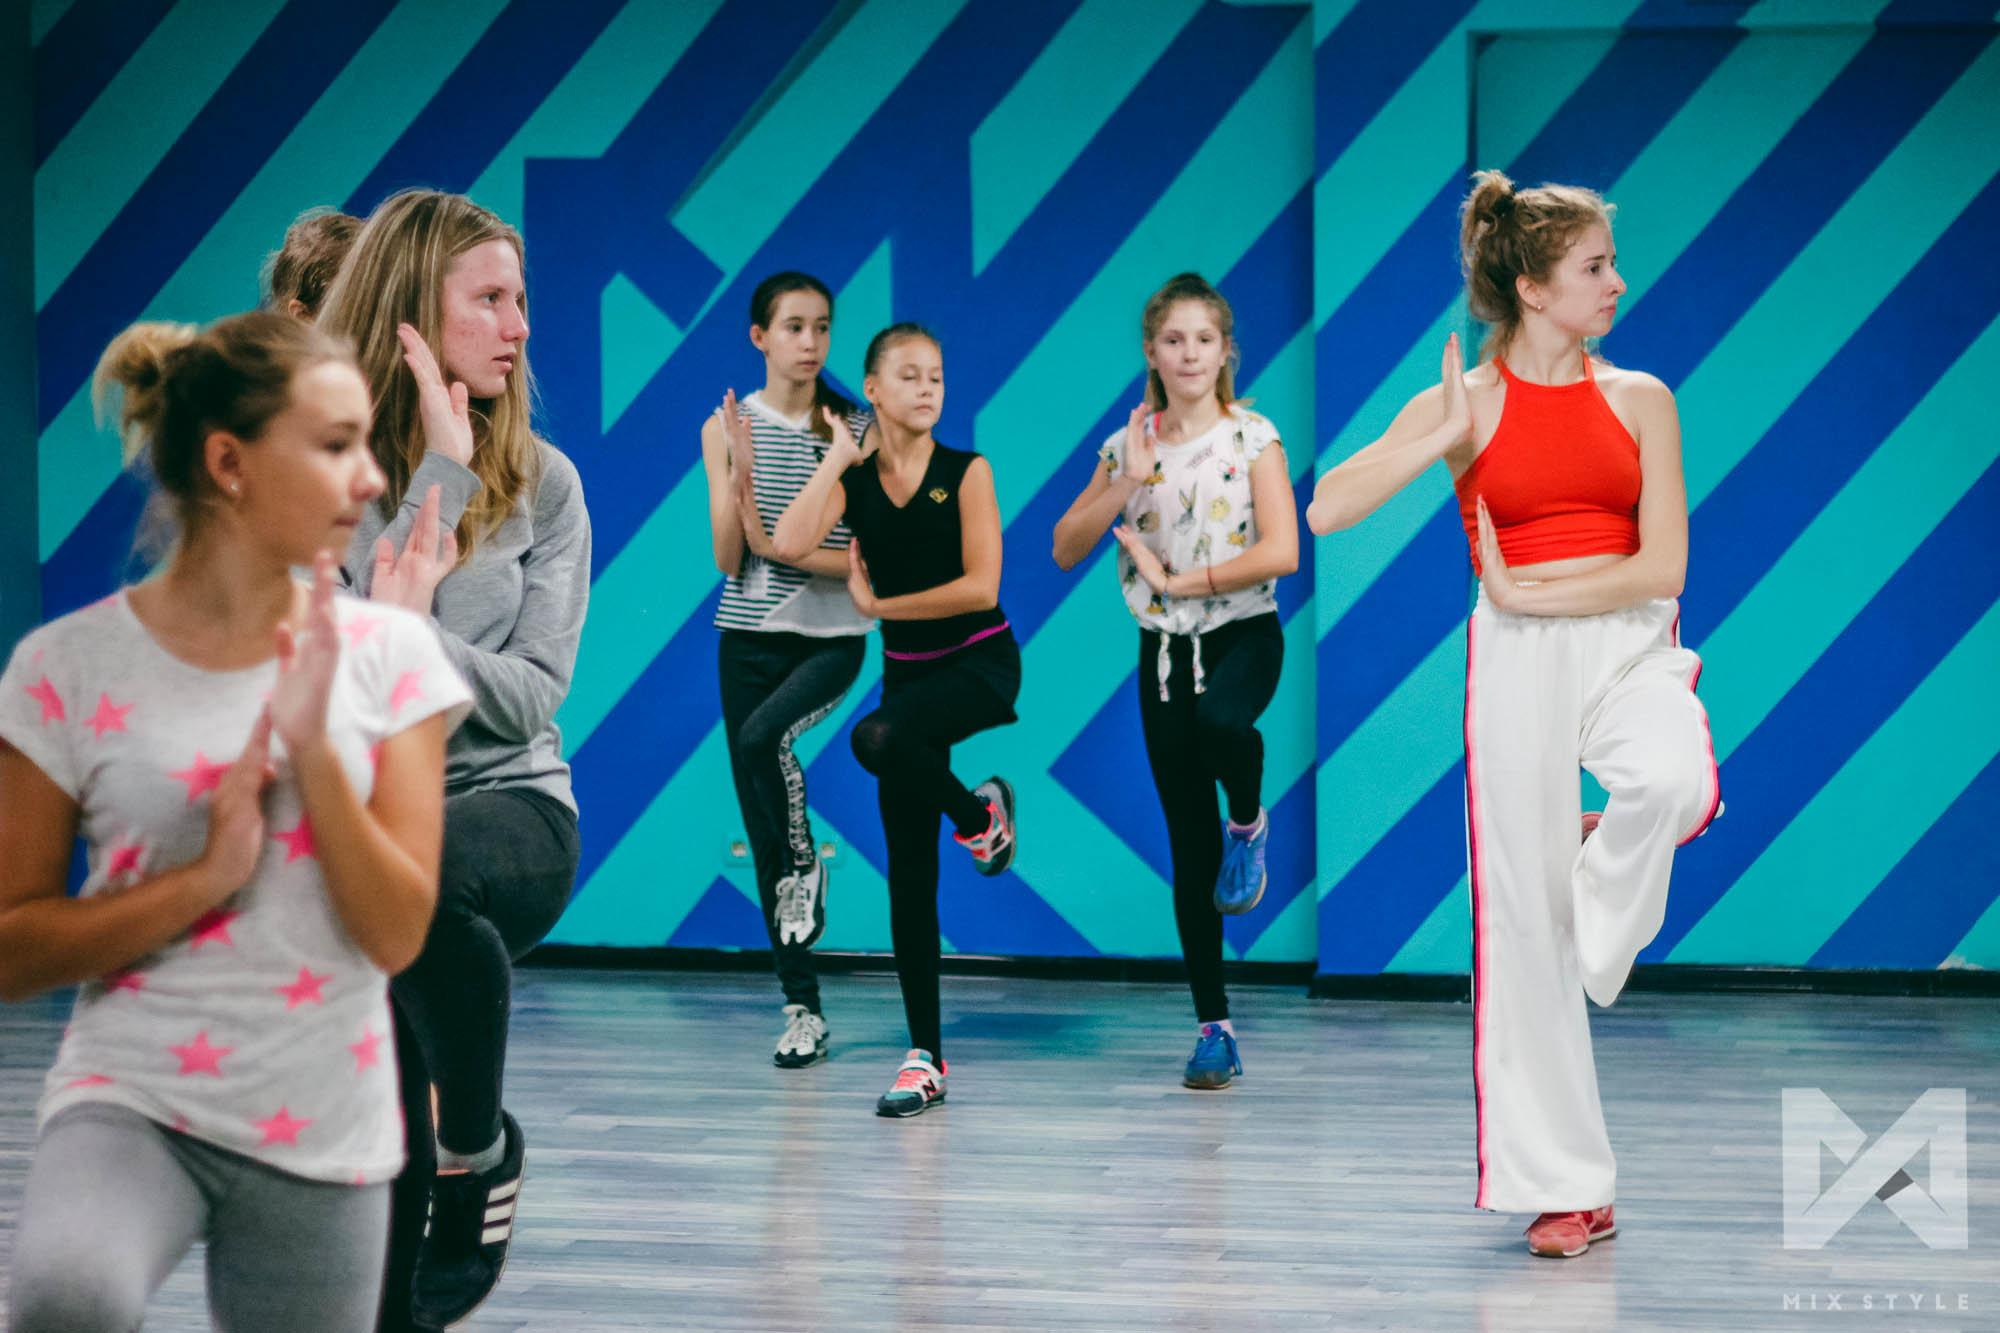 фотография Школы танцев Mixstyle